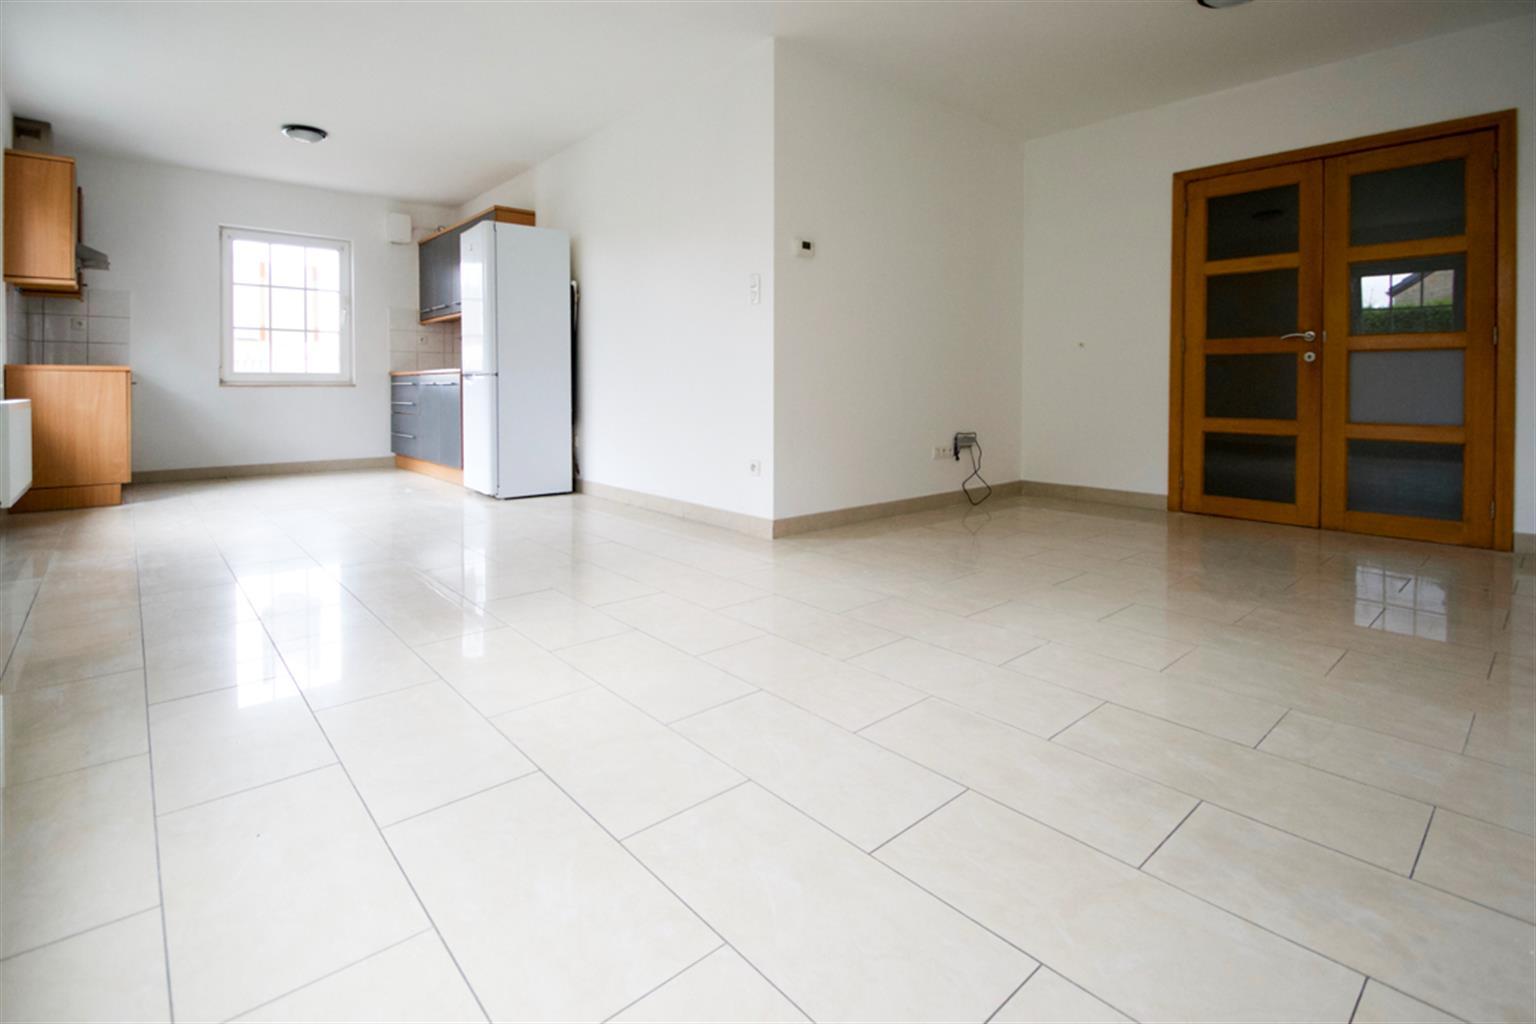 Appartement - Binche Leval-Trahegnies - #4277280-1